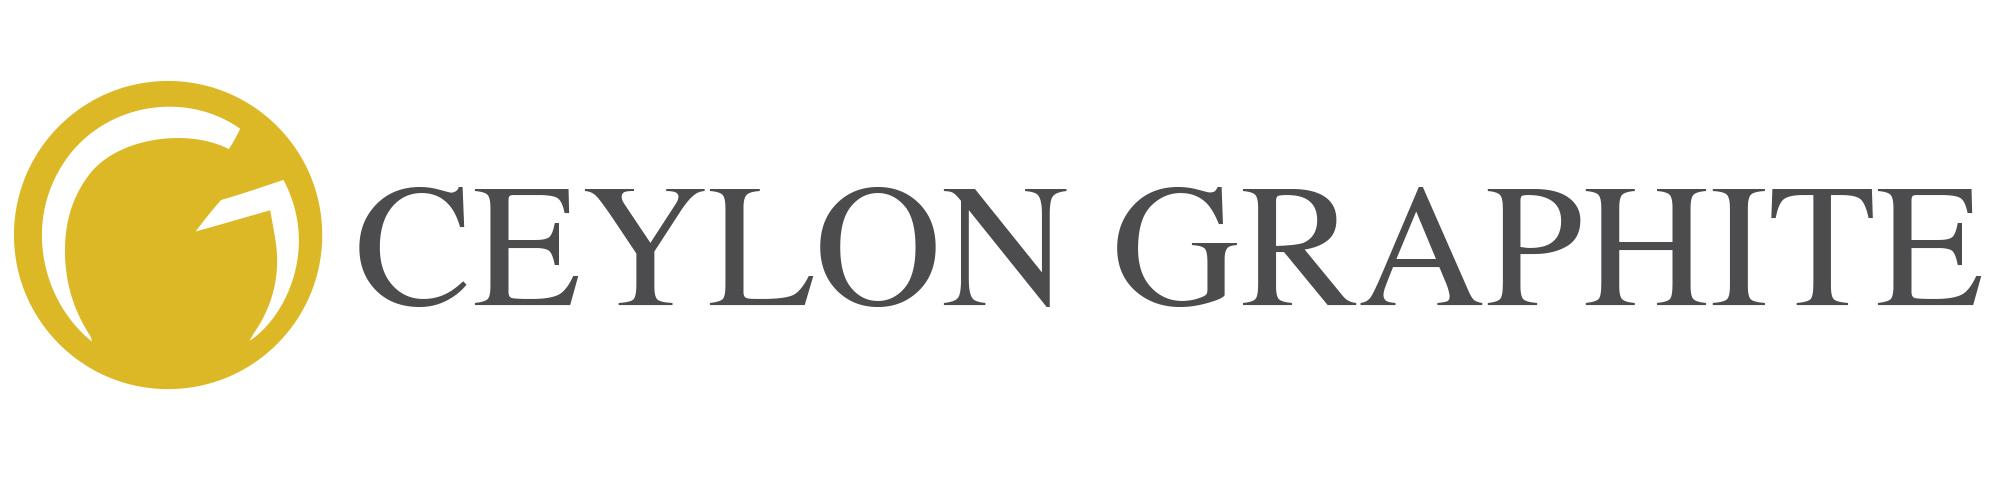 Ceylon Graphite Announces First Commercial Sale of 95-97% Natural Graphite